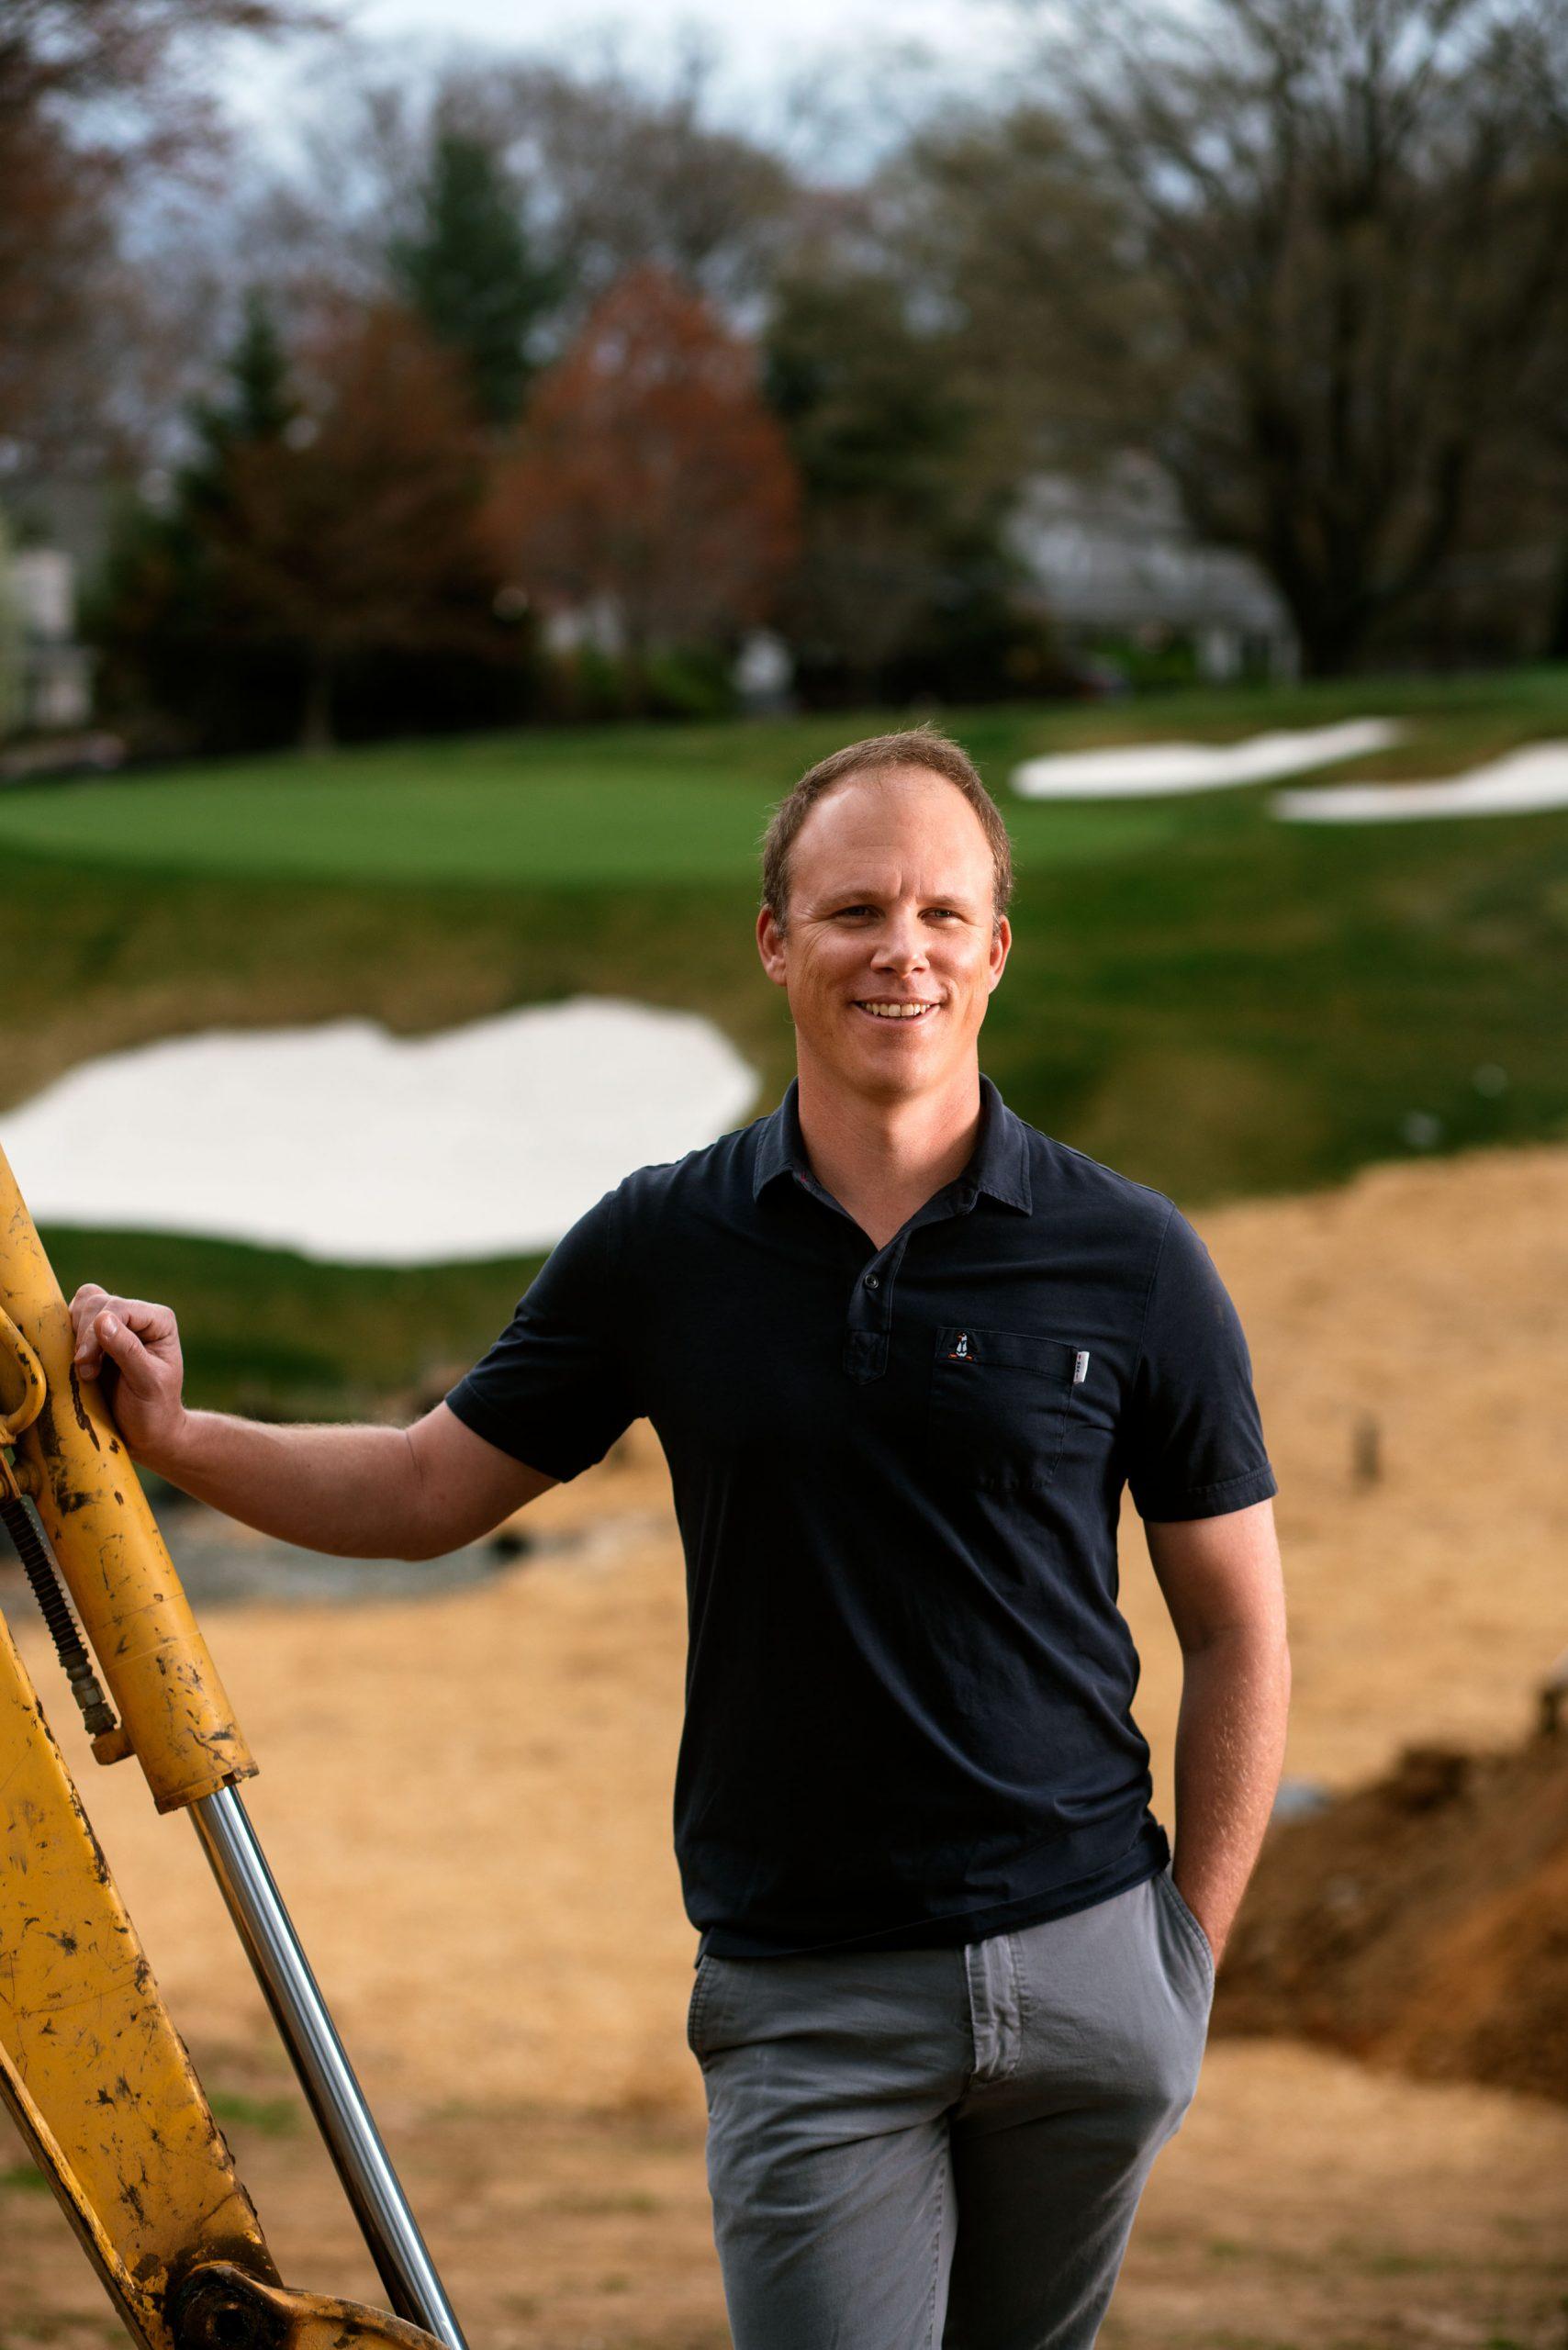 Michael McCartin, Golf Course Shaper